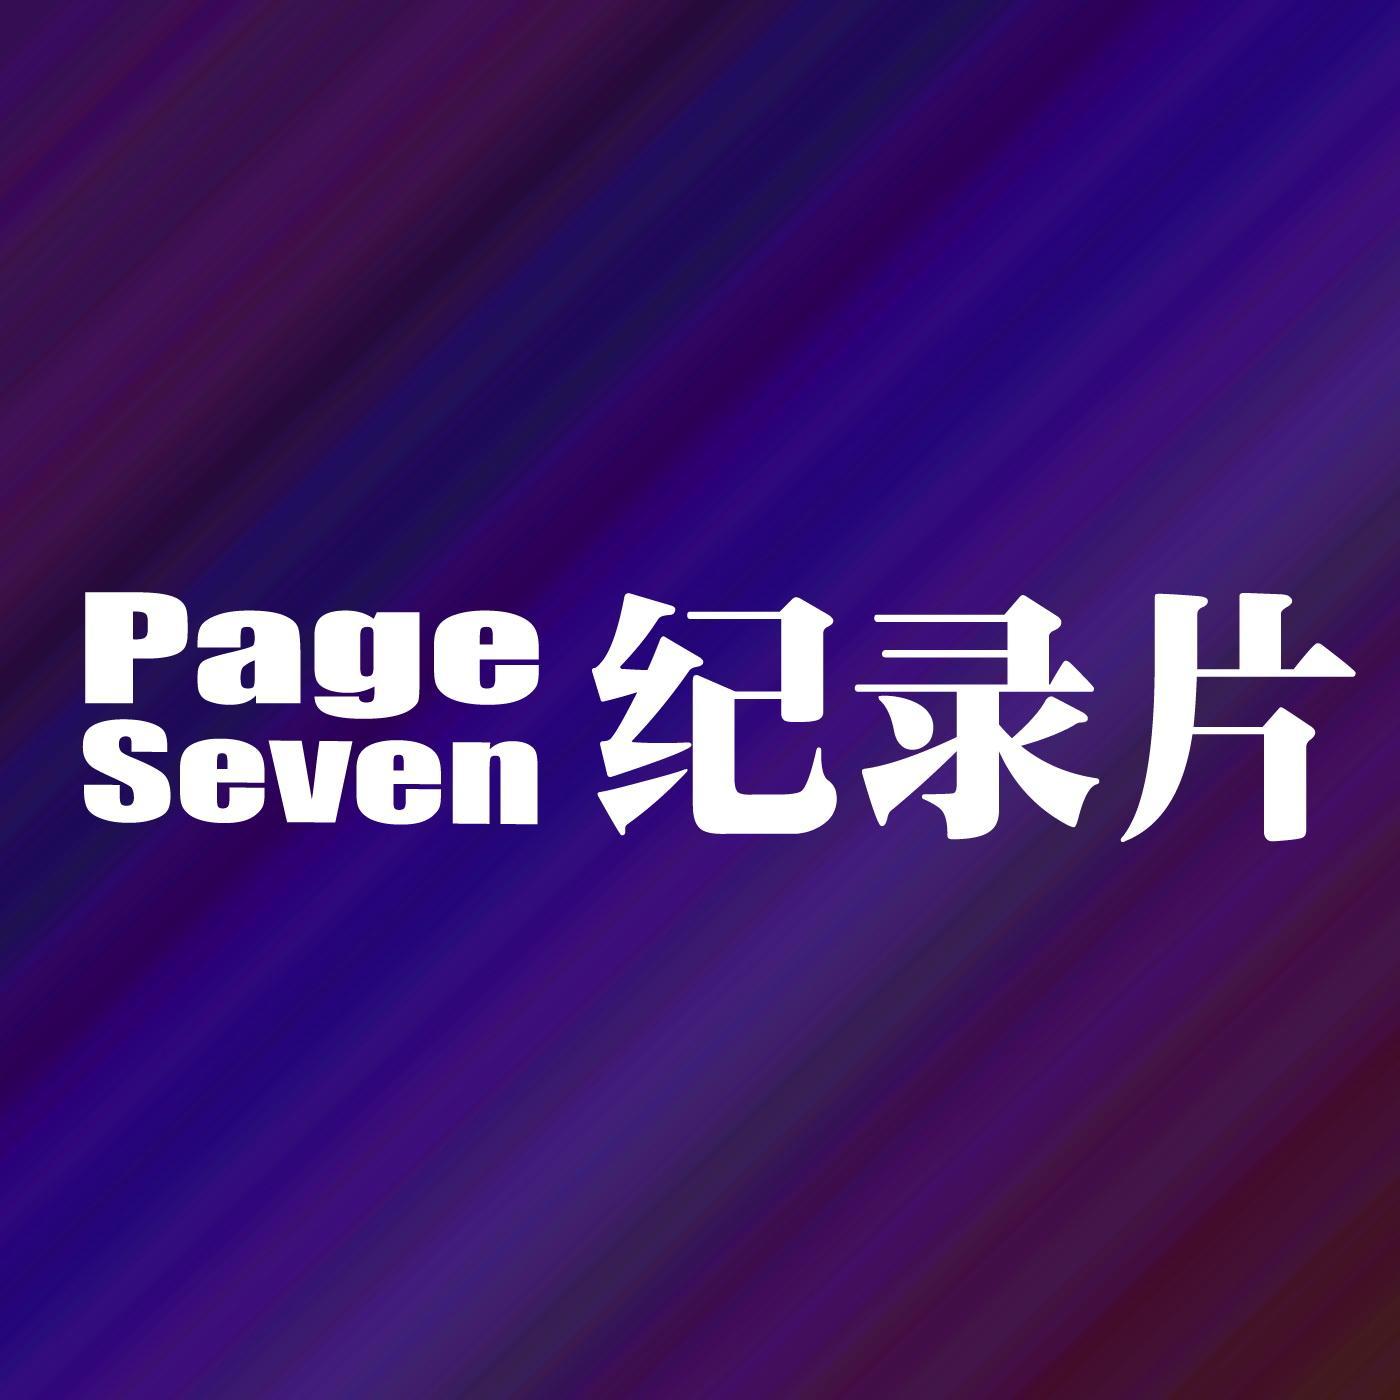 <![CDATA[PAGE SEVEN 纪录片]]>